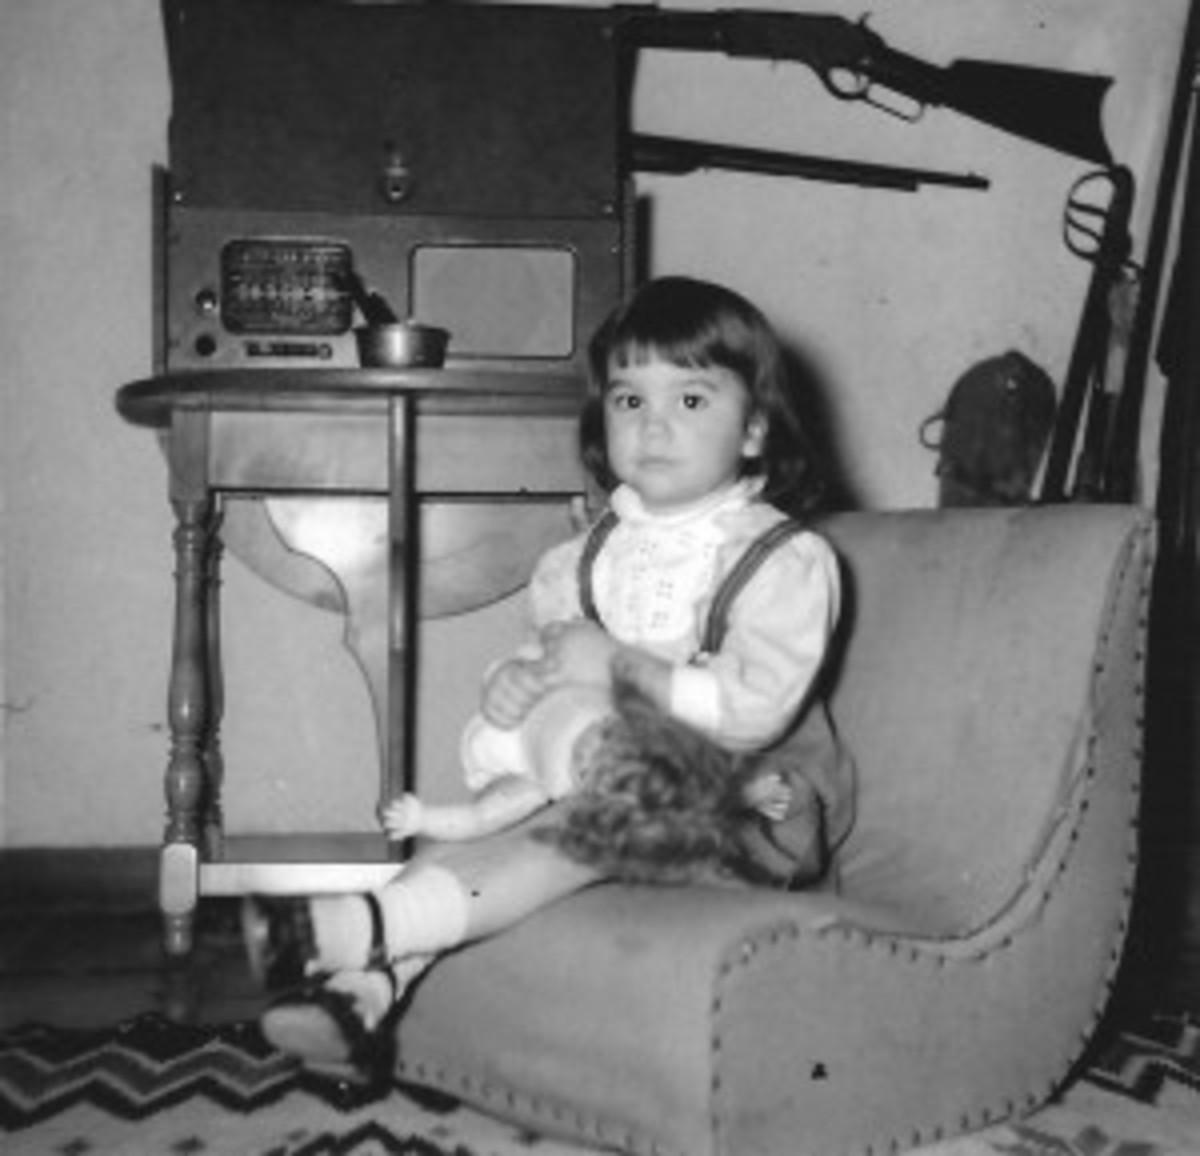 Linda Ronstadt child radio